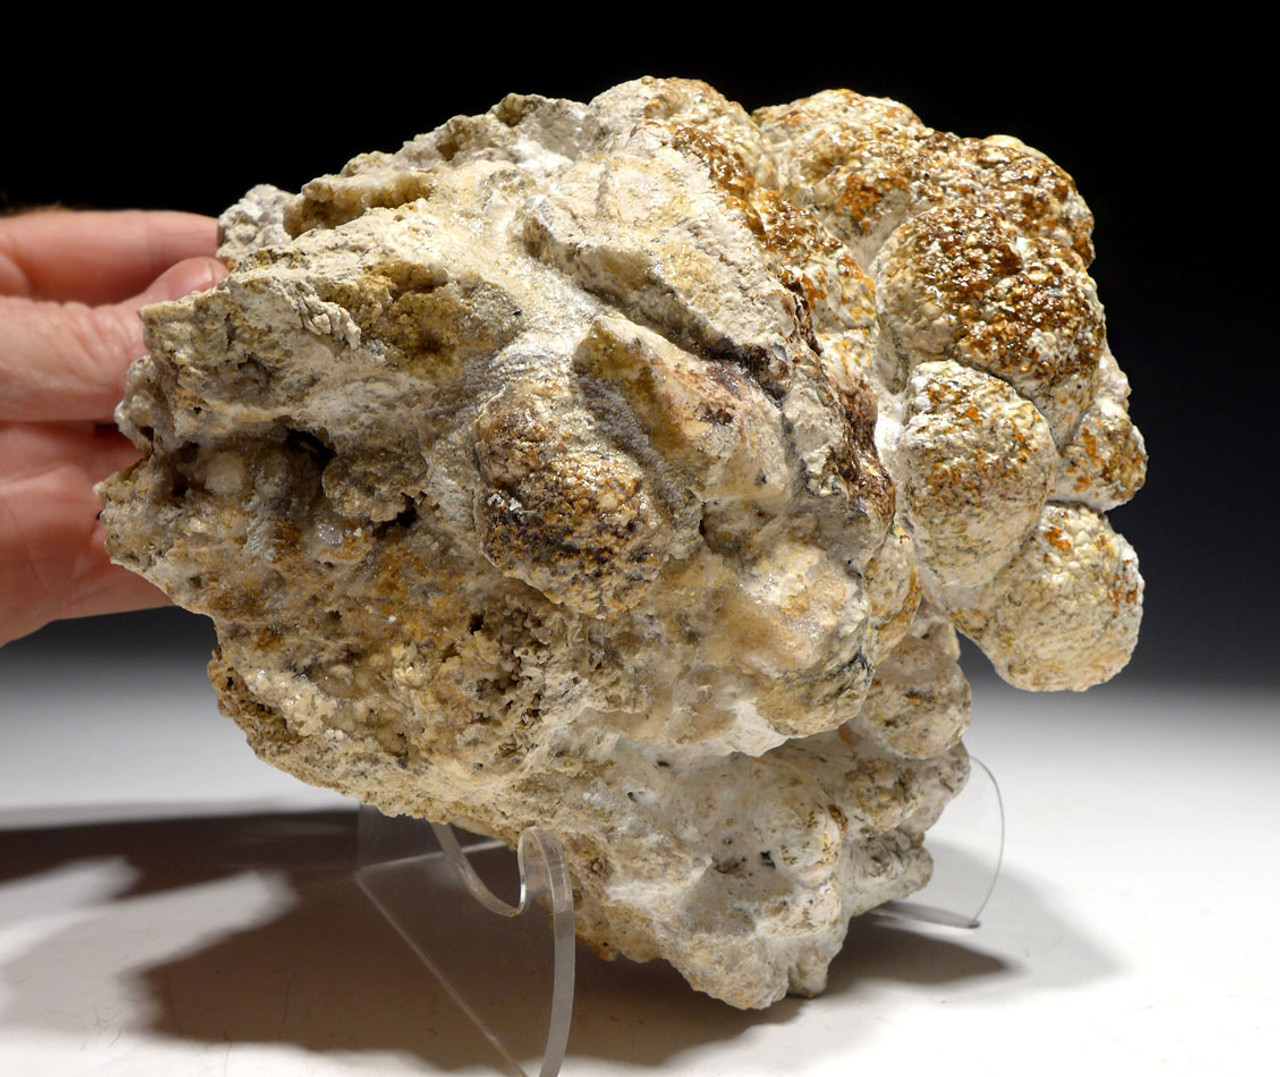 LARGE FOSSIL CYANOBACTERIA STROMATOLITE COLONY FROM A 30 MILLION YEAR LAKE  *STX518